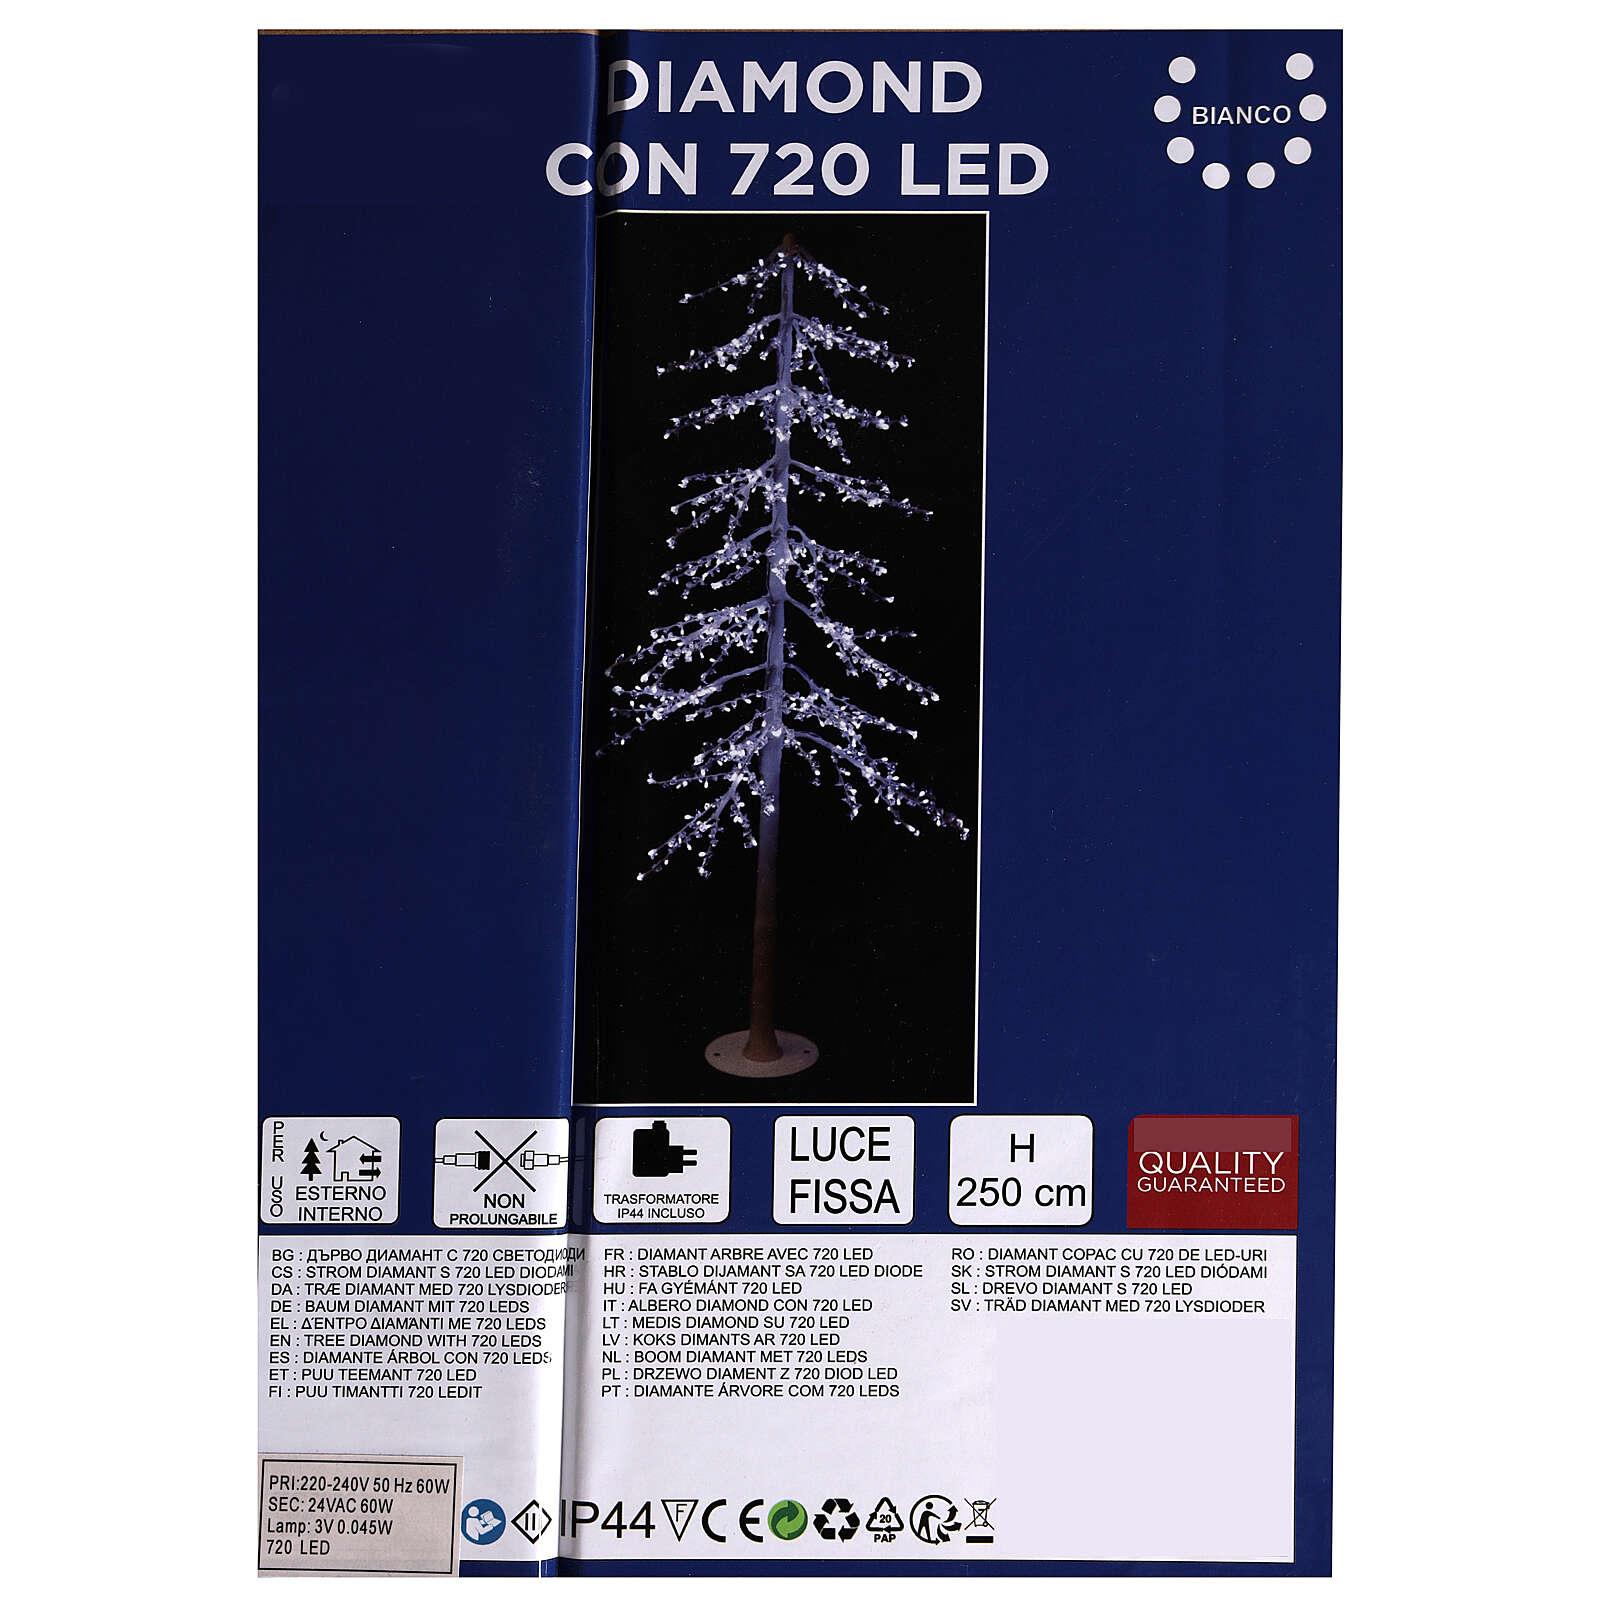 LED Christmas Tree, Diamond, 250 cm 720 LED lights, icy white, outdoor use 3